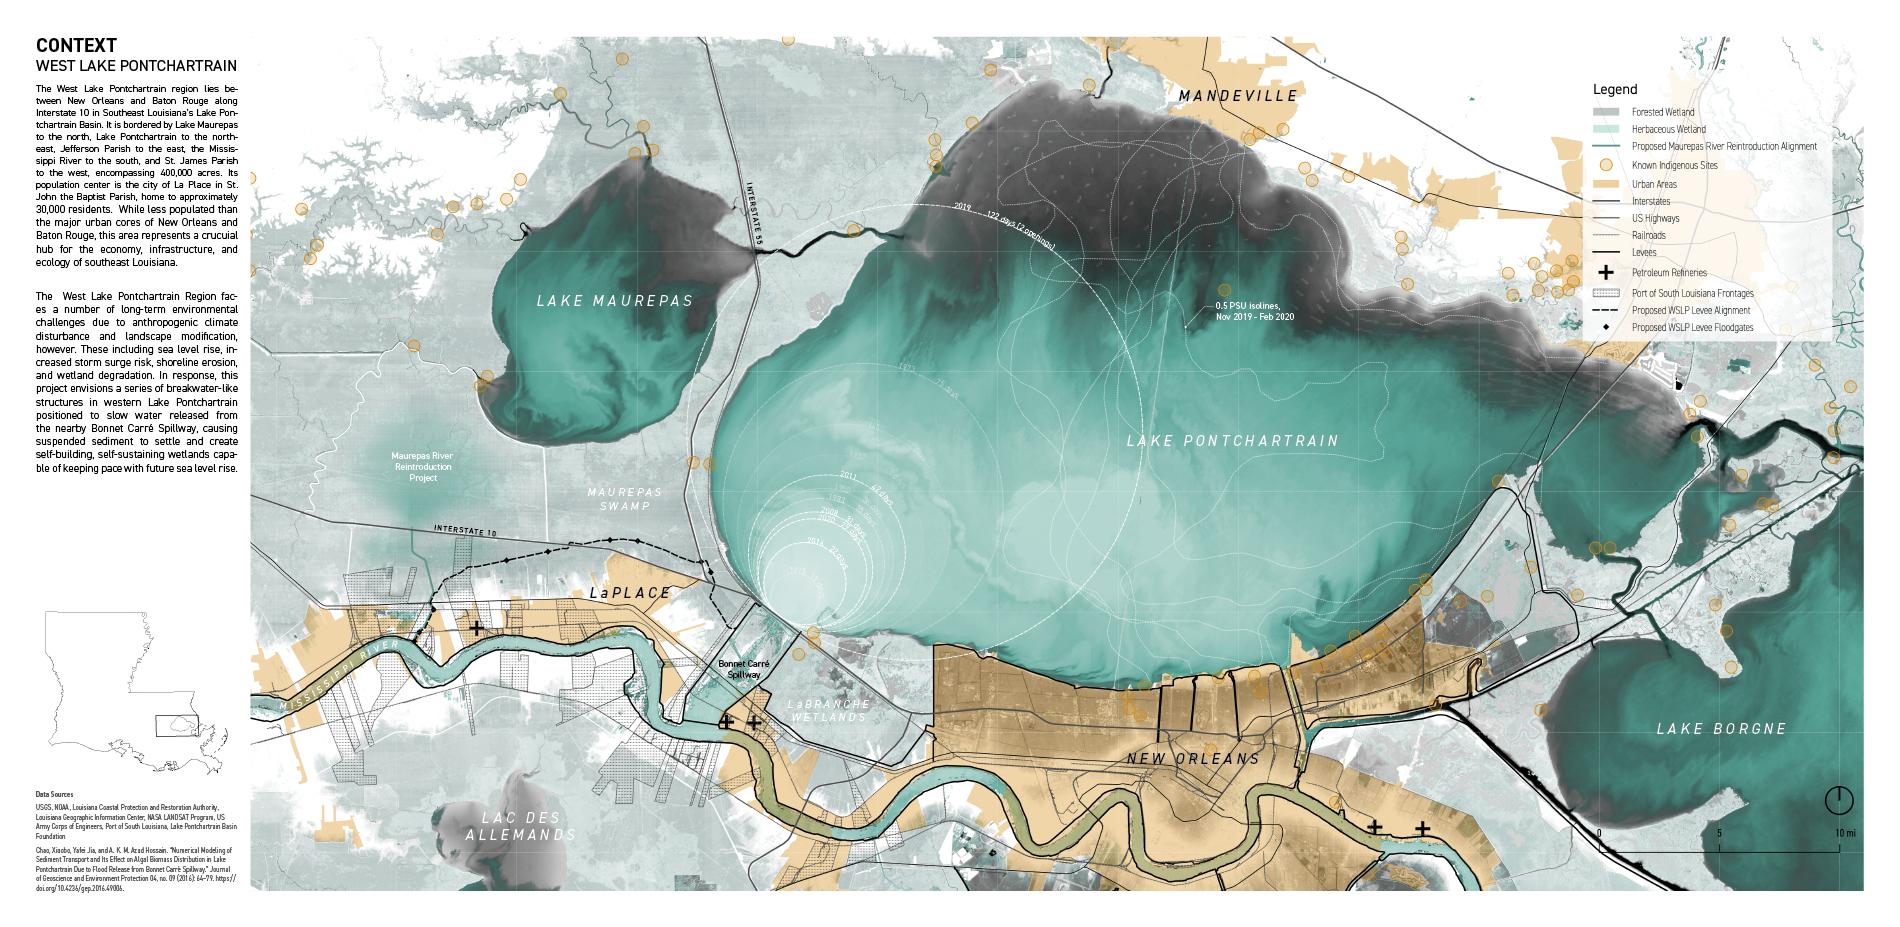 The West Lake Pontchartrain Region